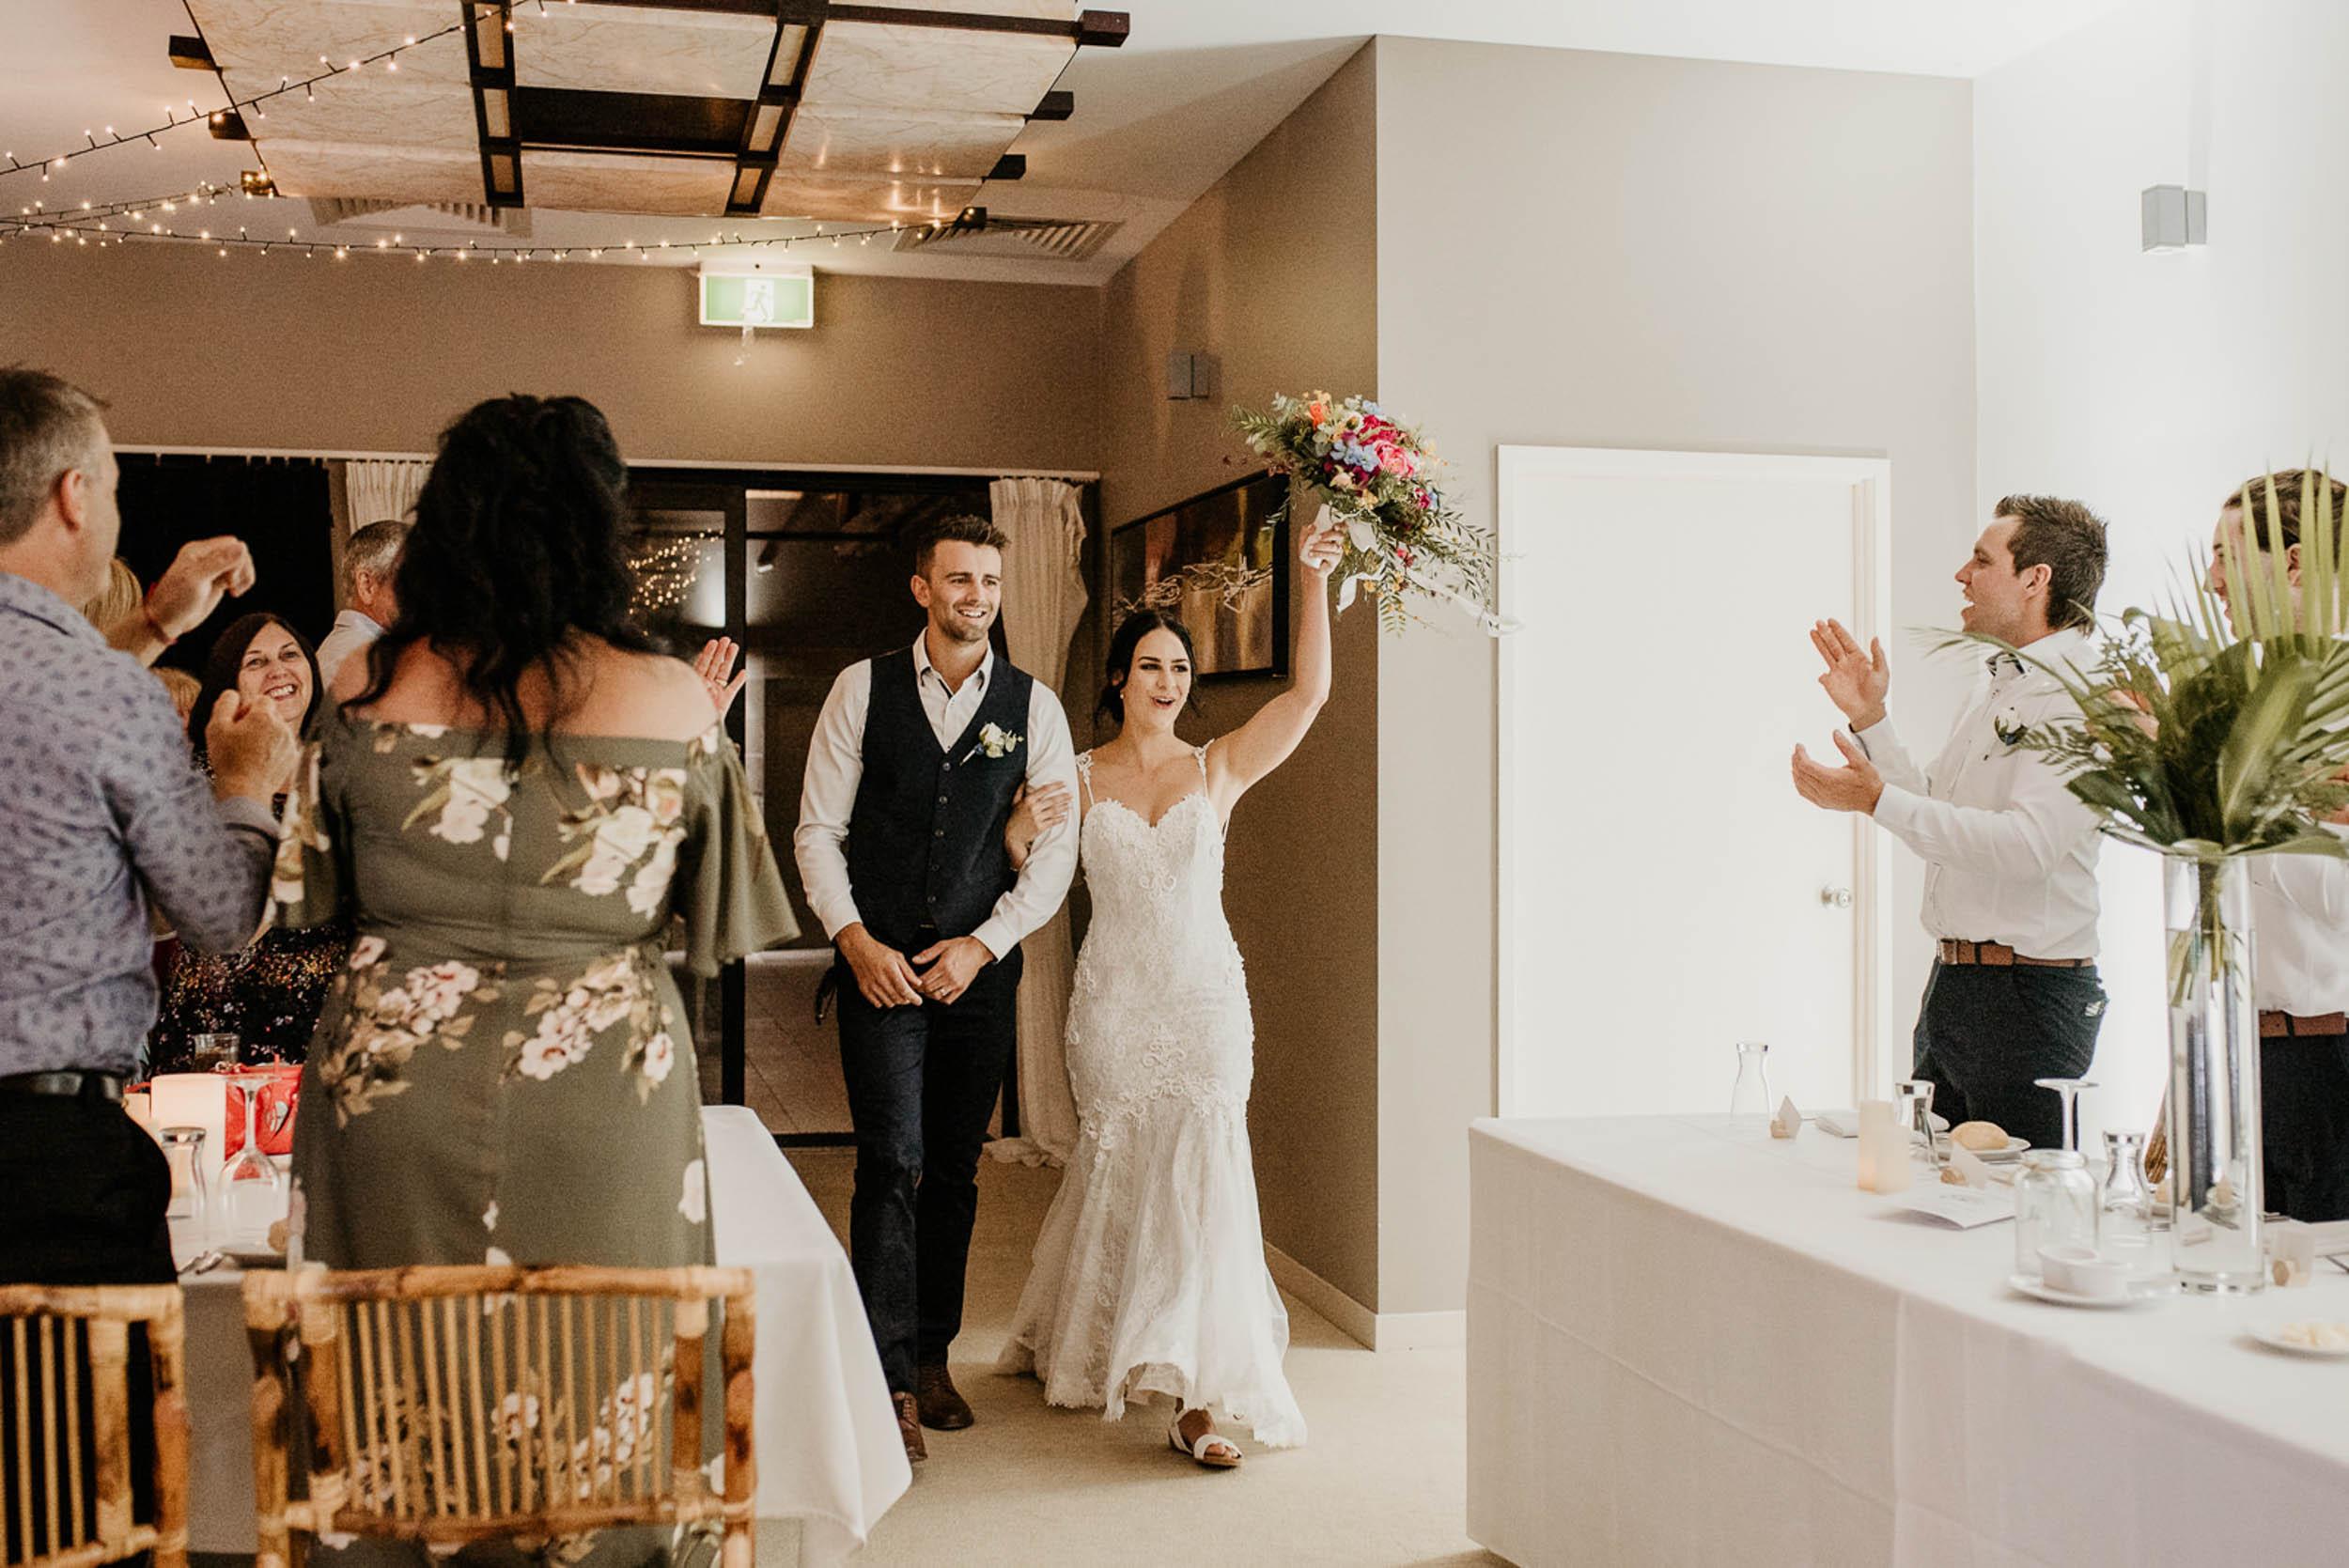 The Raw Photographer - Cairns Wedding Photographer - Fitzroy Island - Destination Wedding - Bride Dress - Groom Portrait - Queensland-44.jpg